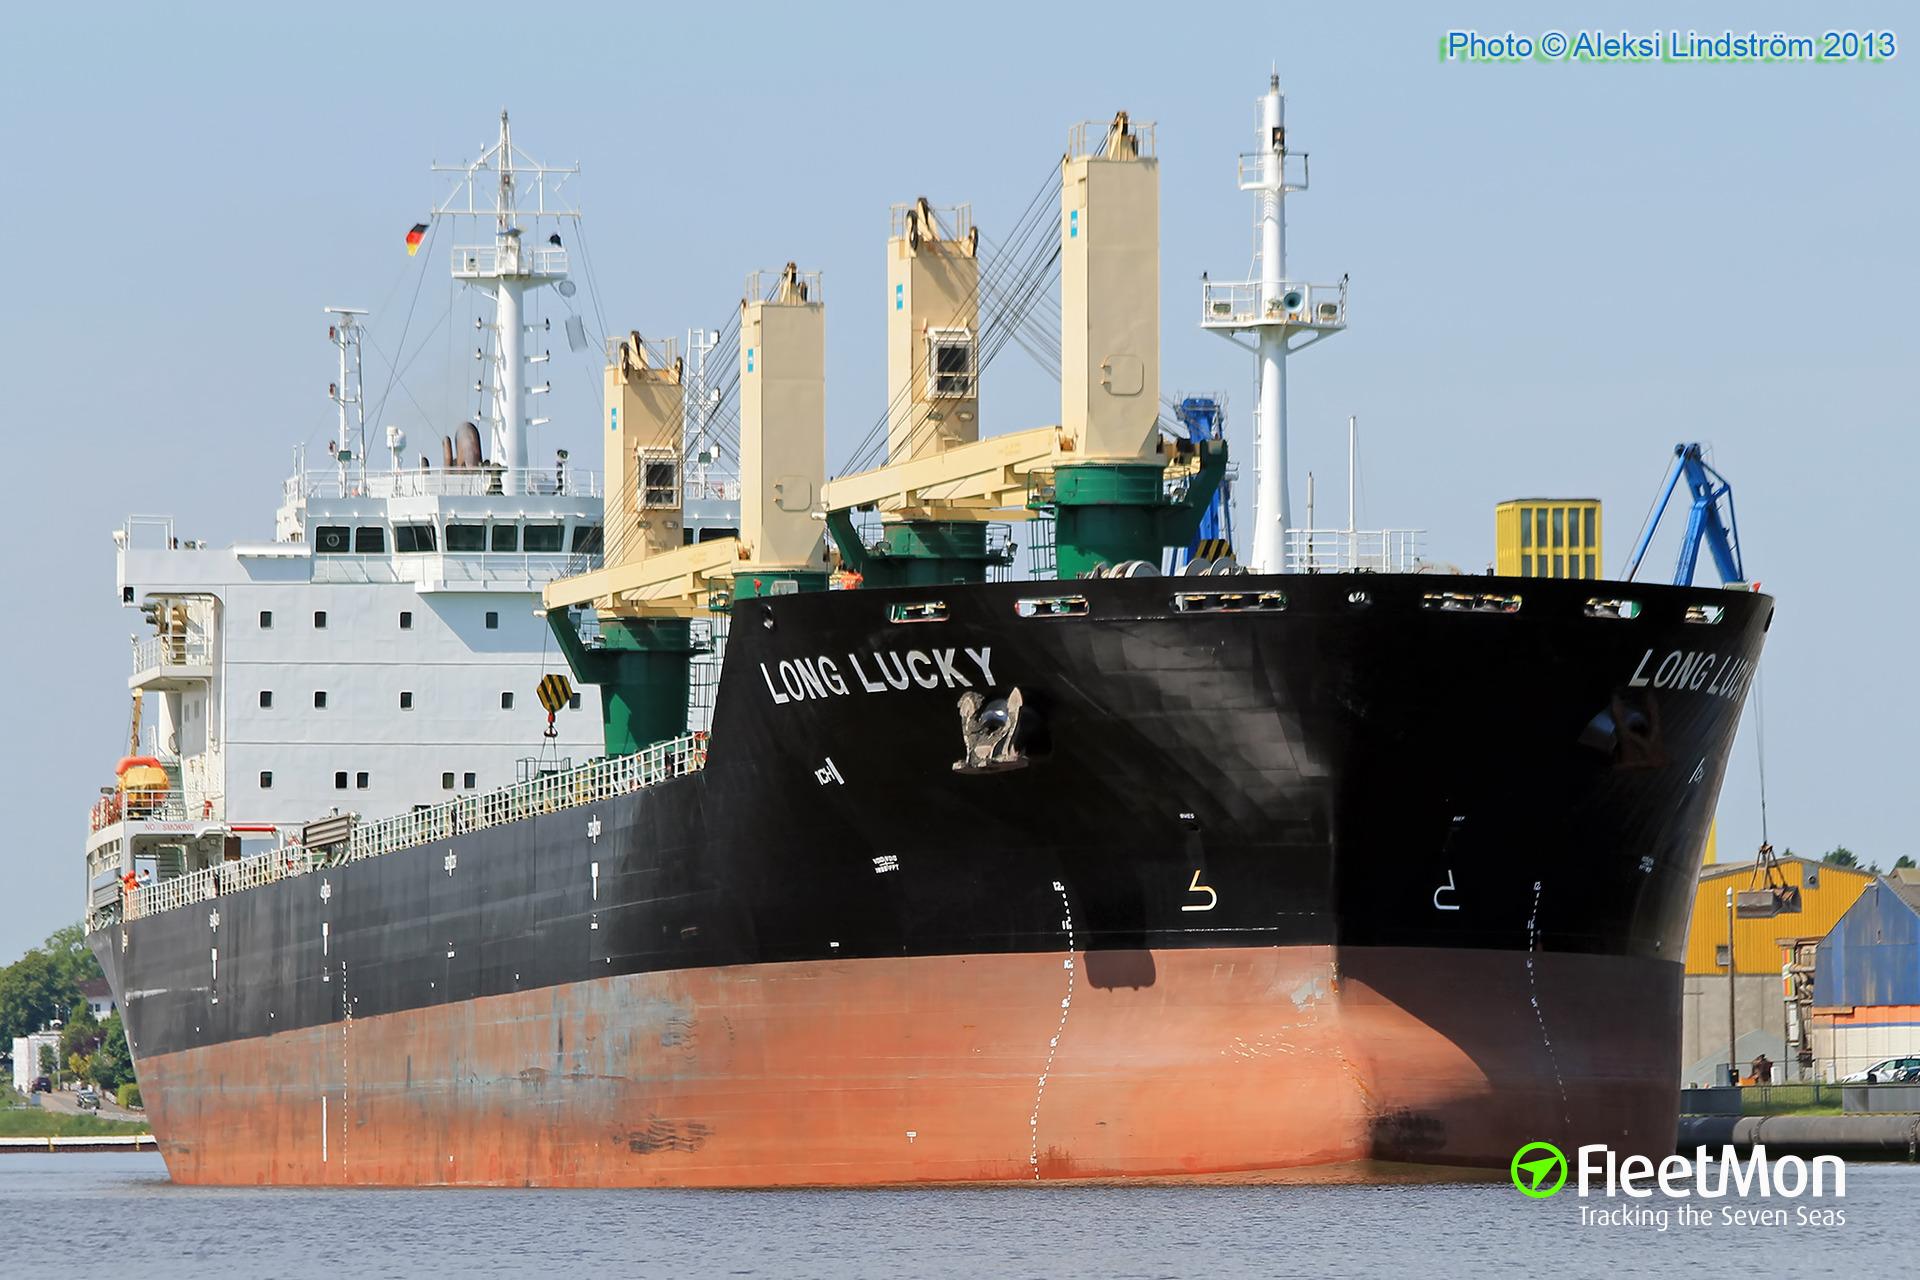 Bulk carrier Long Lucky allided with lock's gate in Kiel-Holtenau